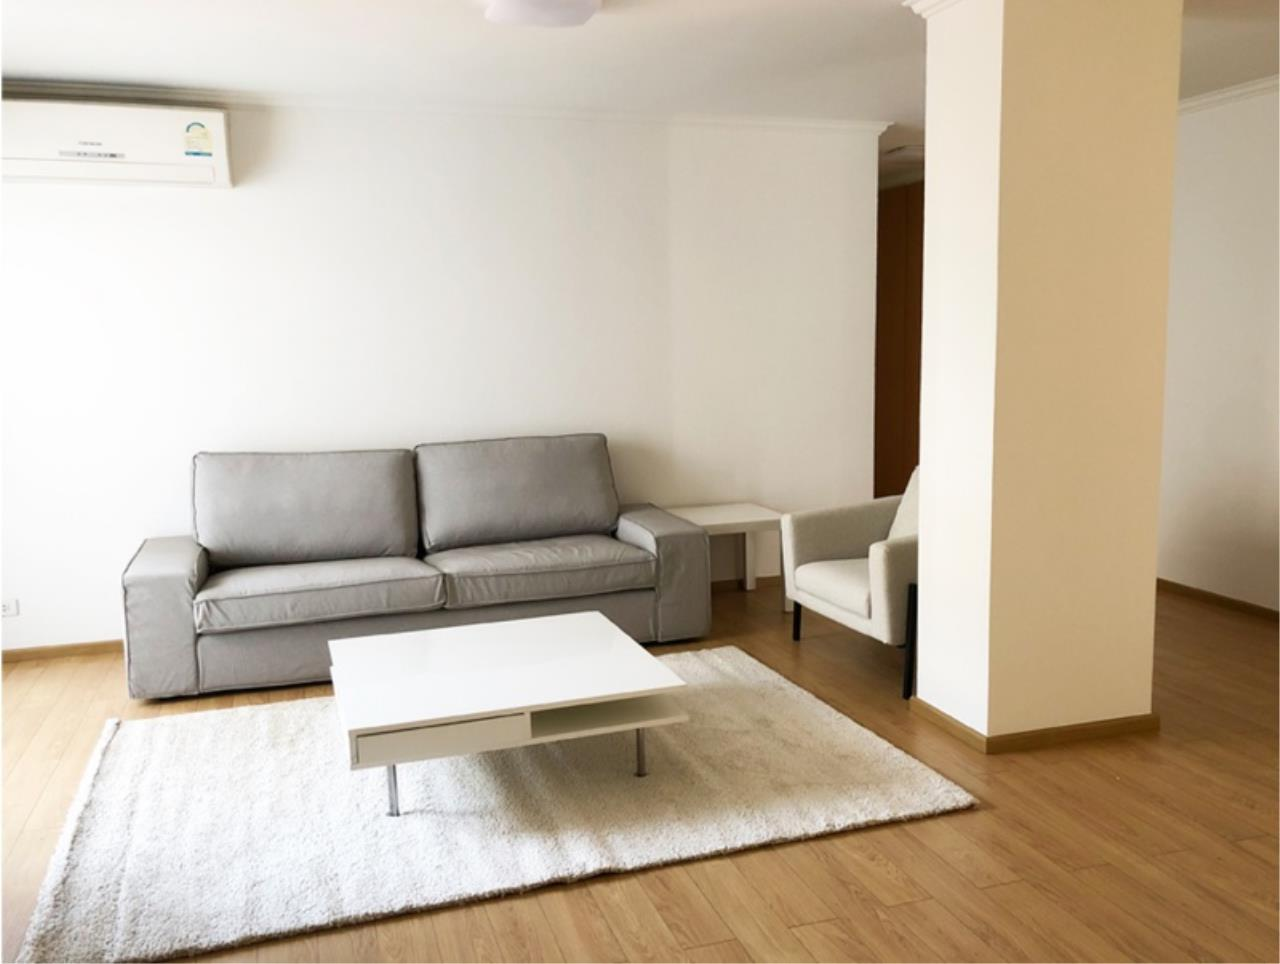 Century21 Skylux Agency's Witthayu Court / Apartment (Serviced) For Rent / 3 Bedroom / 170 SQM / BTS Phloen Chit / Bangkok 2